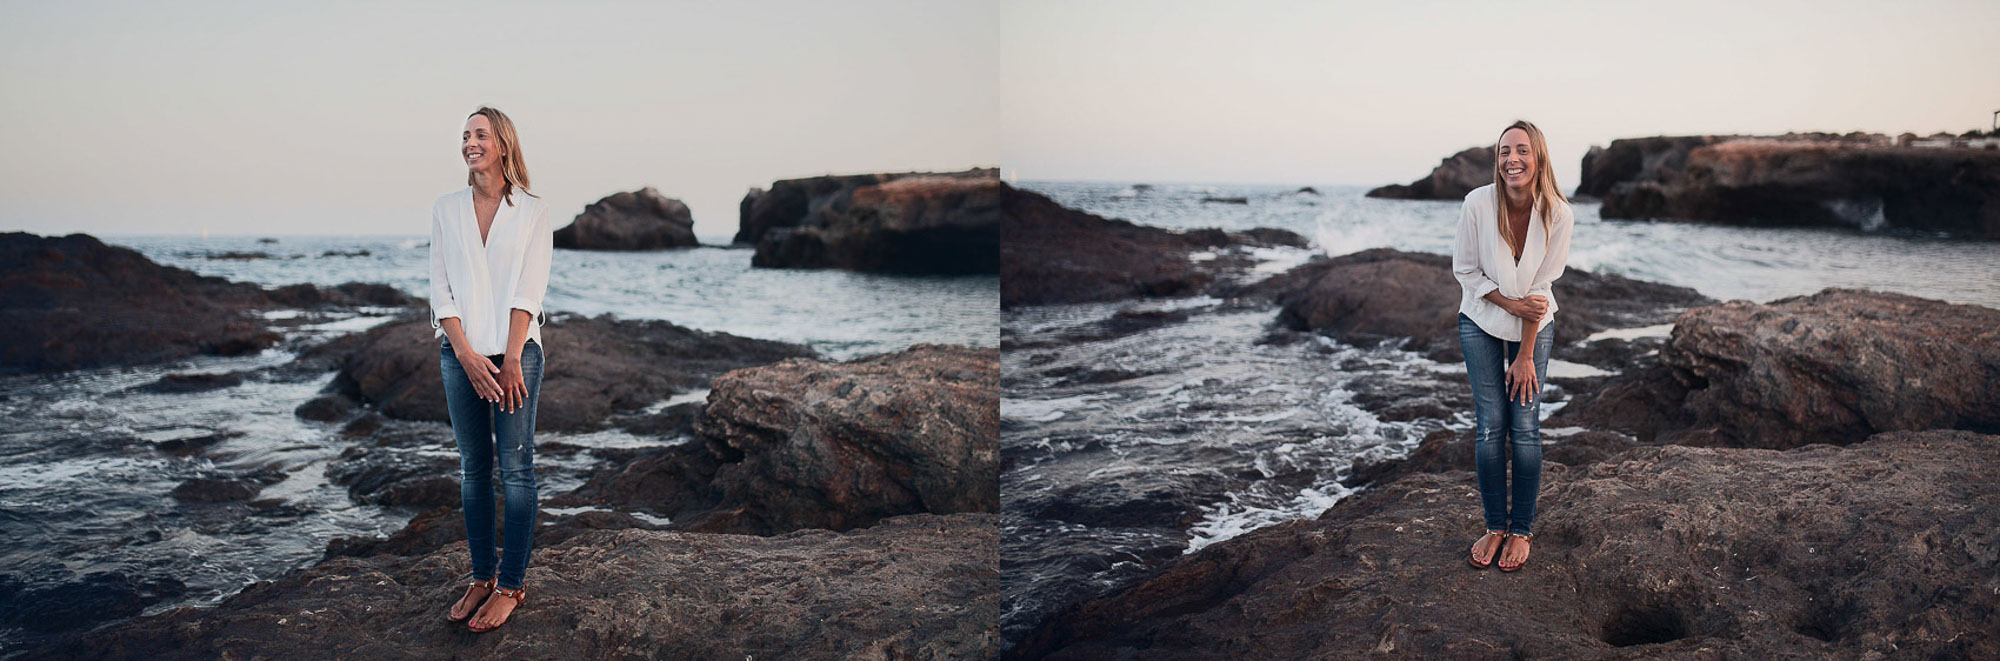 novia rubia sonrisa playa cabo de palos rocas atardecer